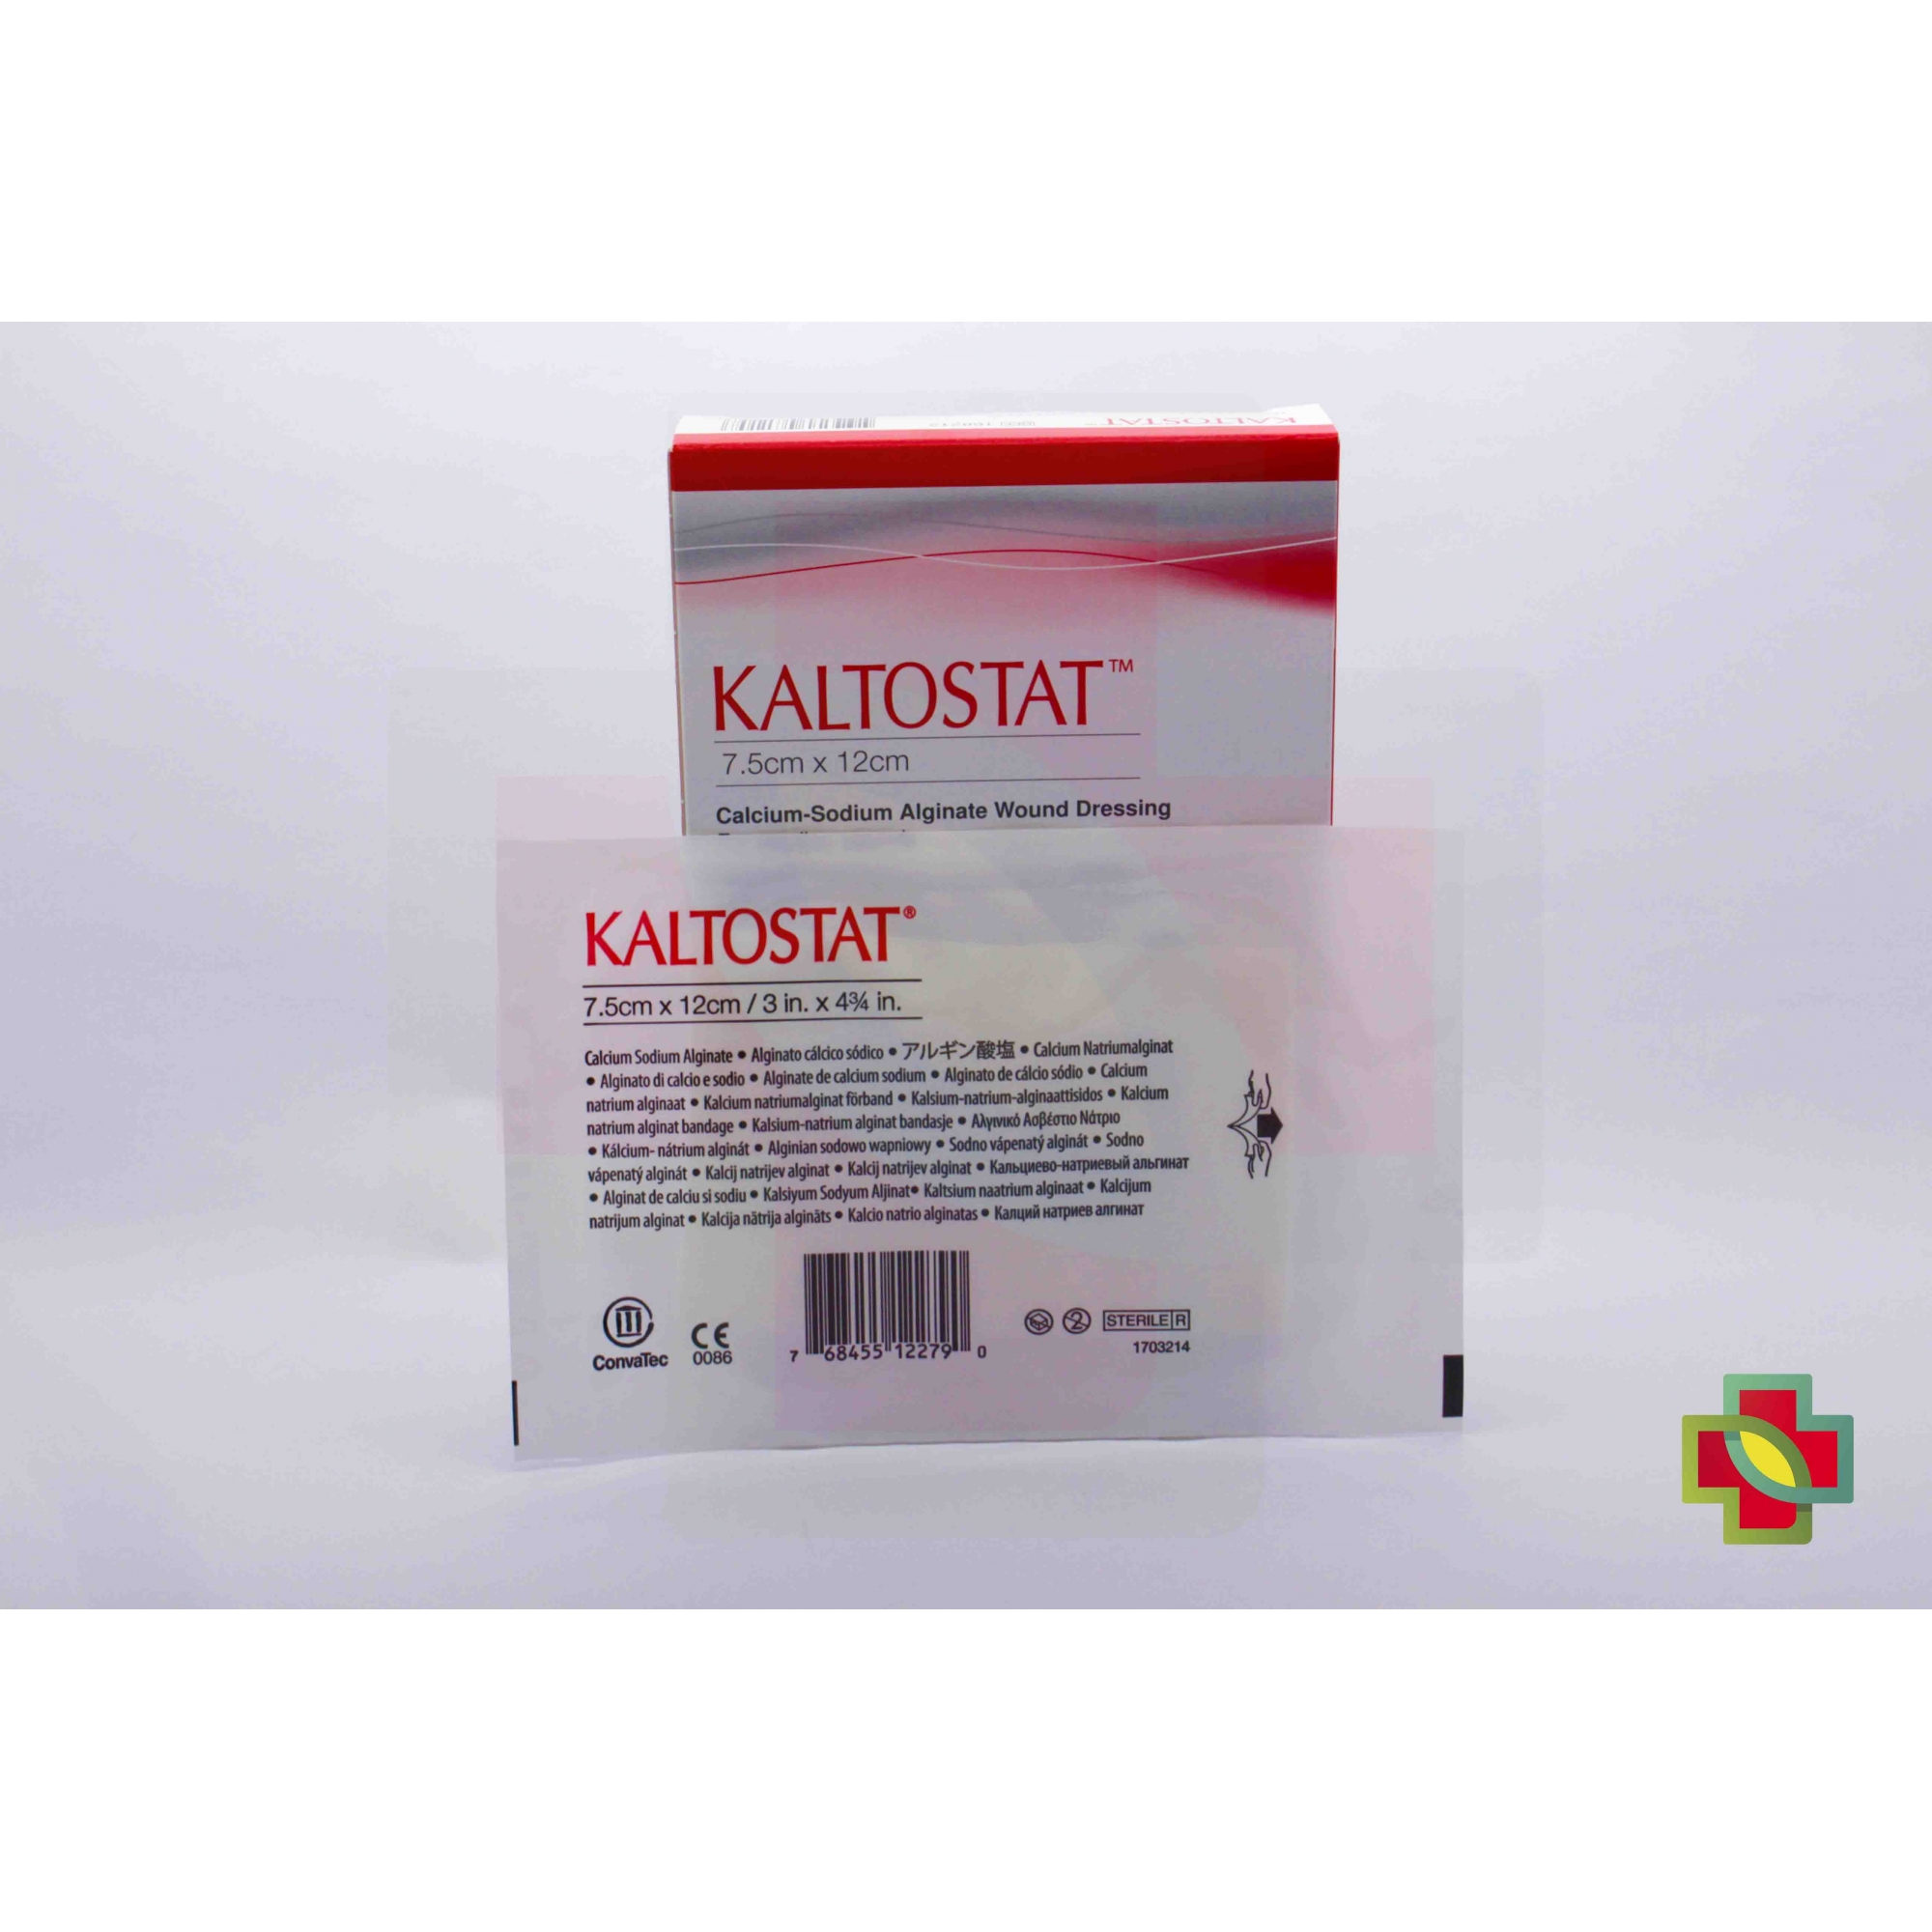 CURATIVO KALTOSTAT 7,5 X 12 CM UND. 168212 - CONVATEC